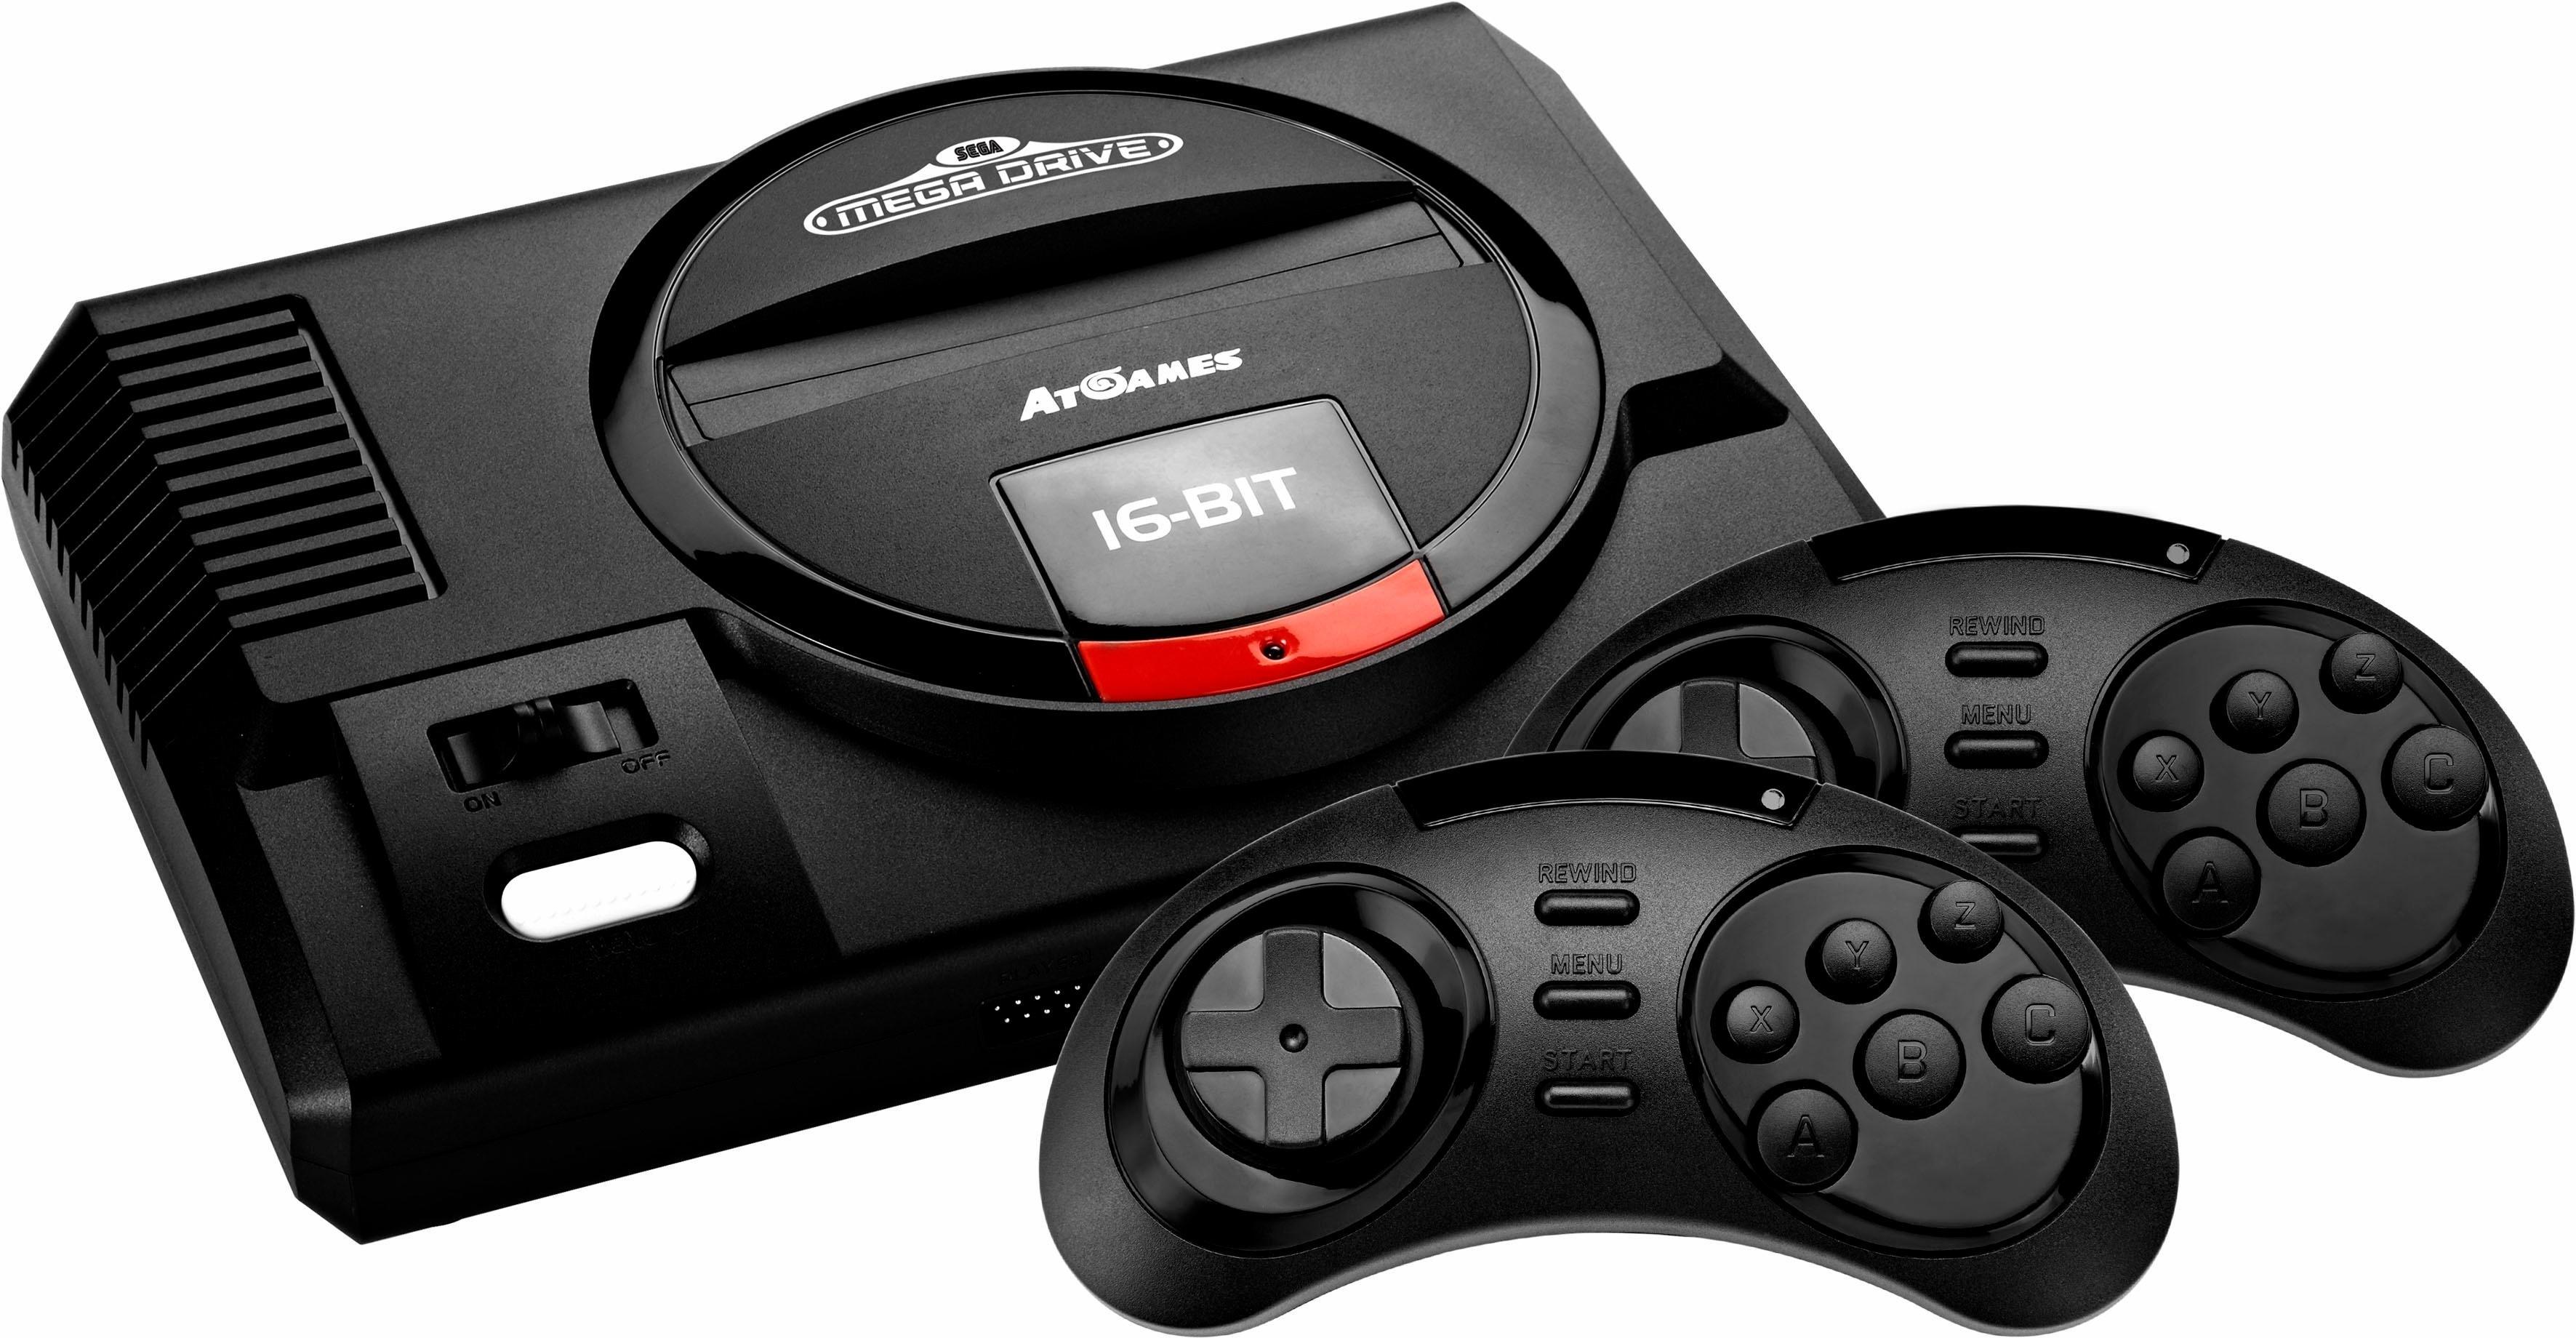 Sega Megadrive Flashback - verschillende betaalmethodes